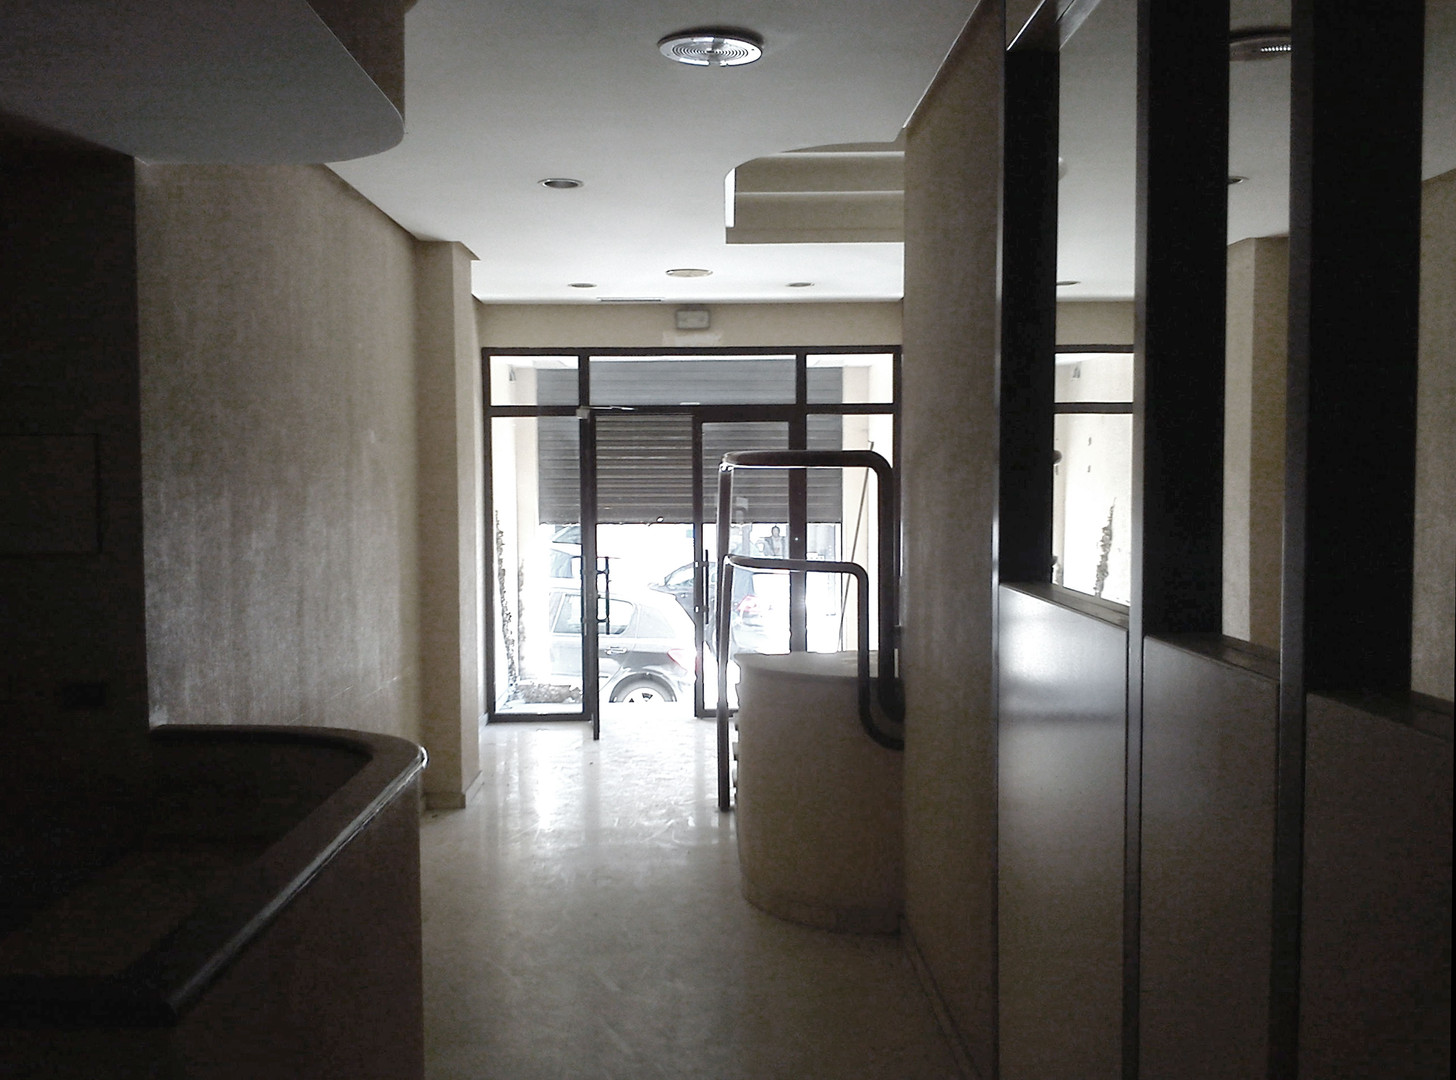 arquitectura-senmais-13.17.21.jpg